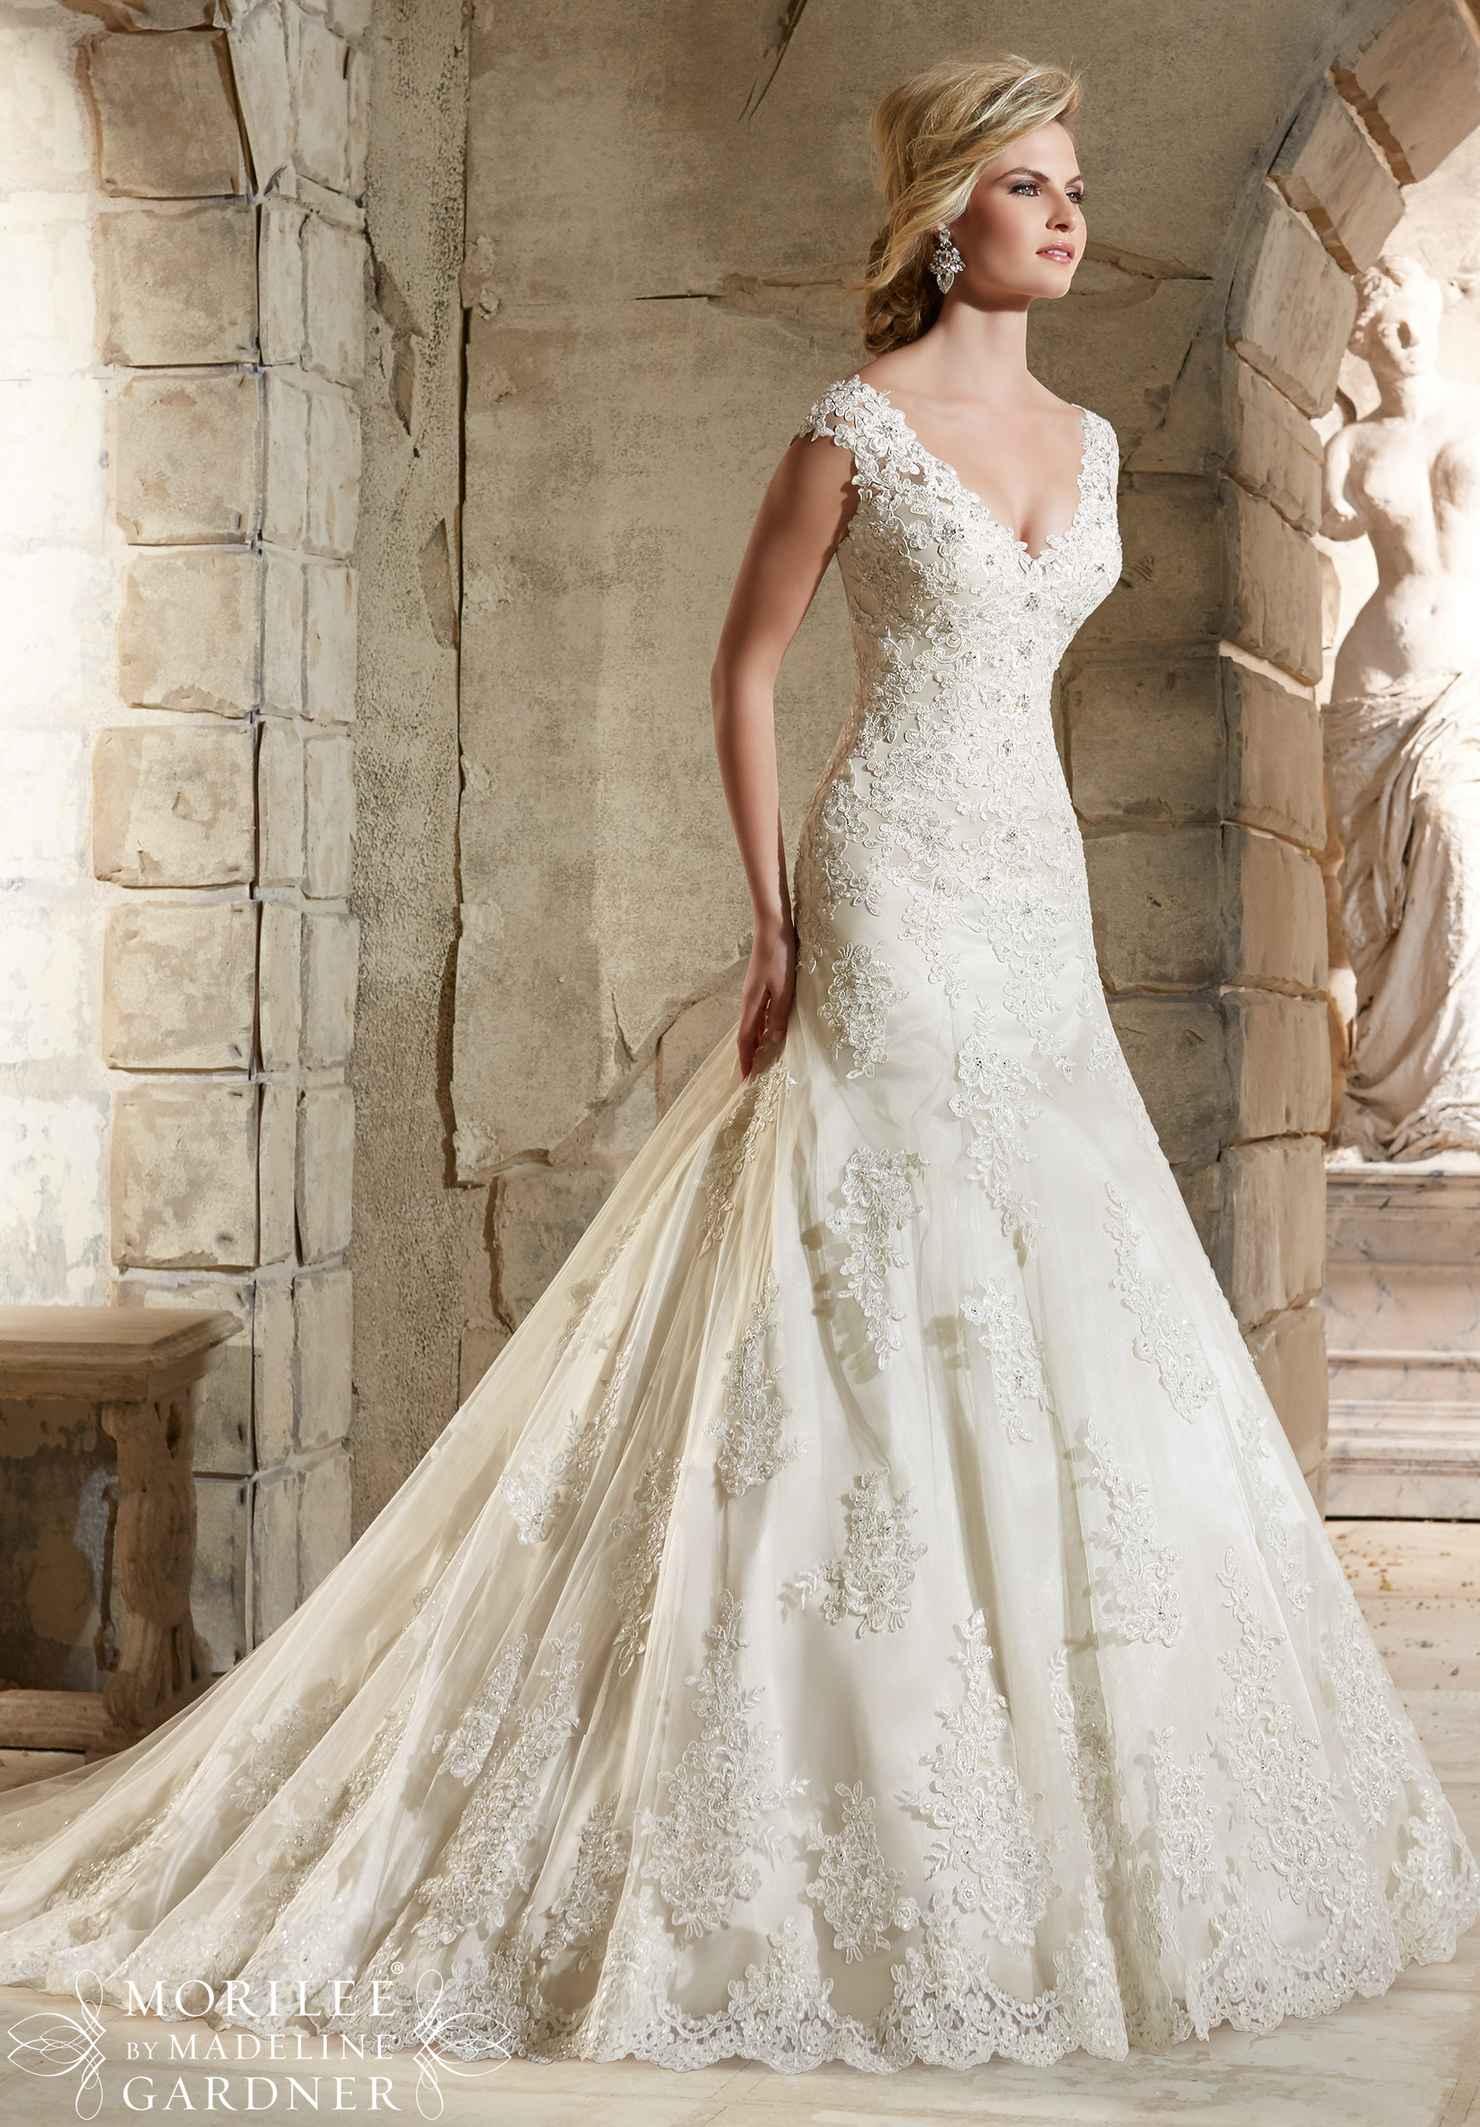 Wedding Dress Mori Lee 2785 Bucharest Romania Wedding Package